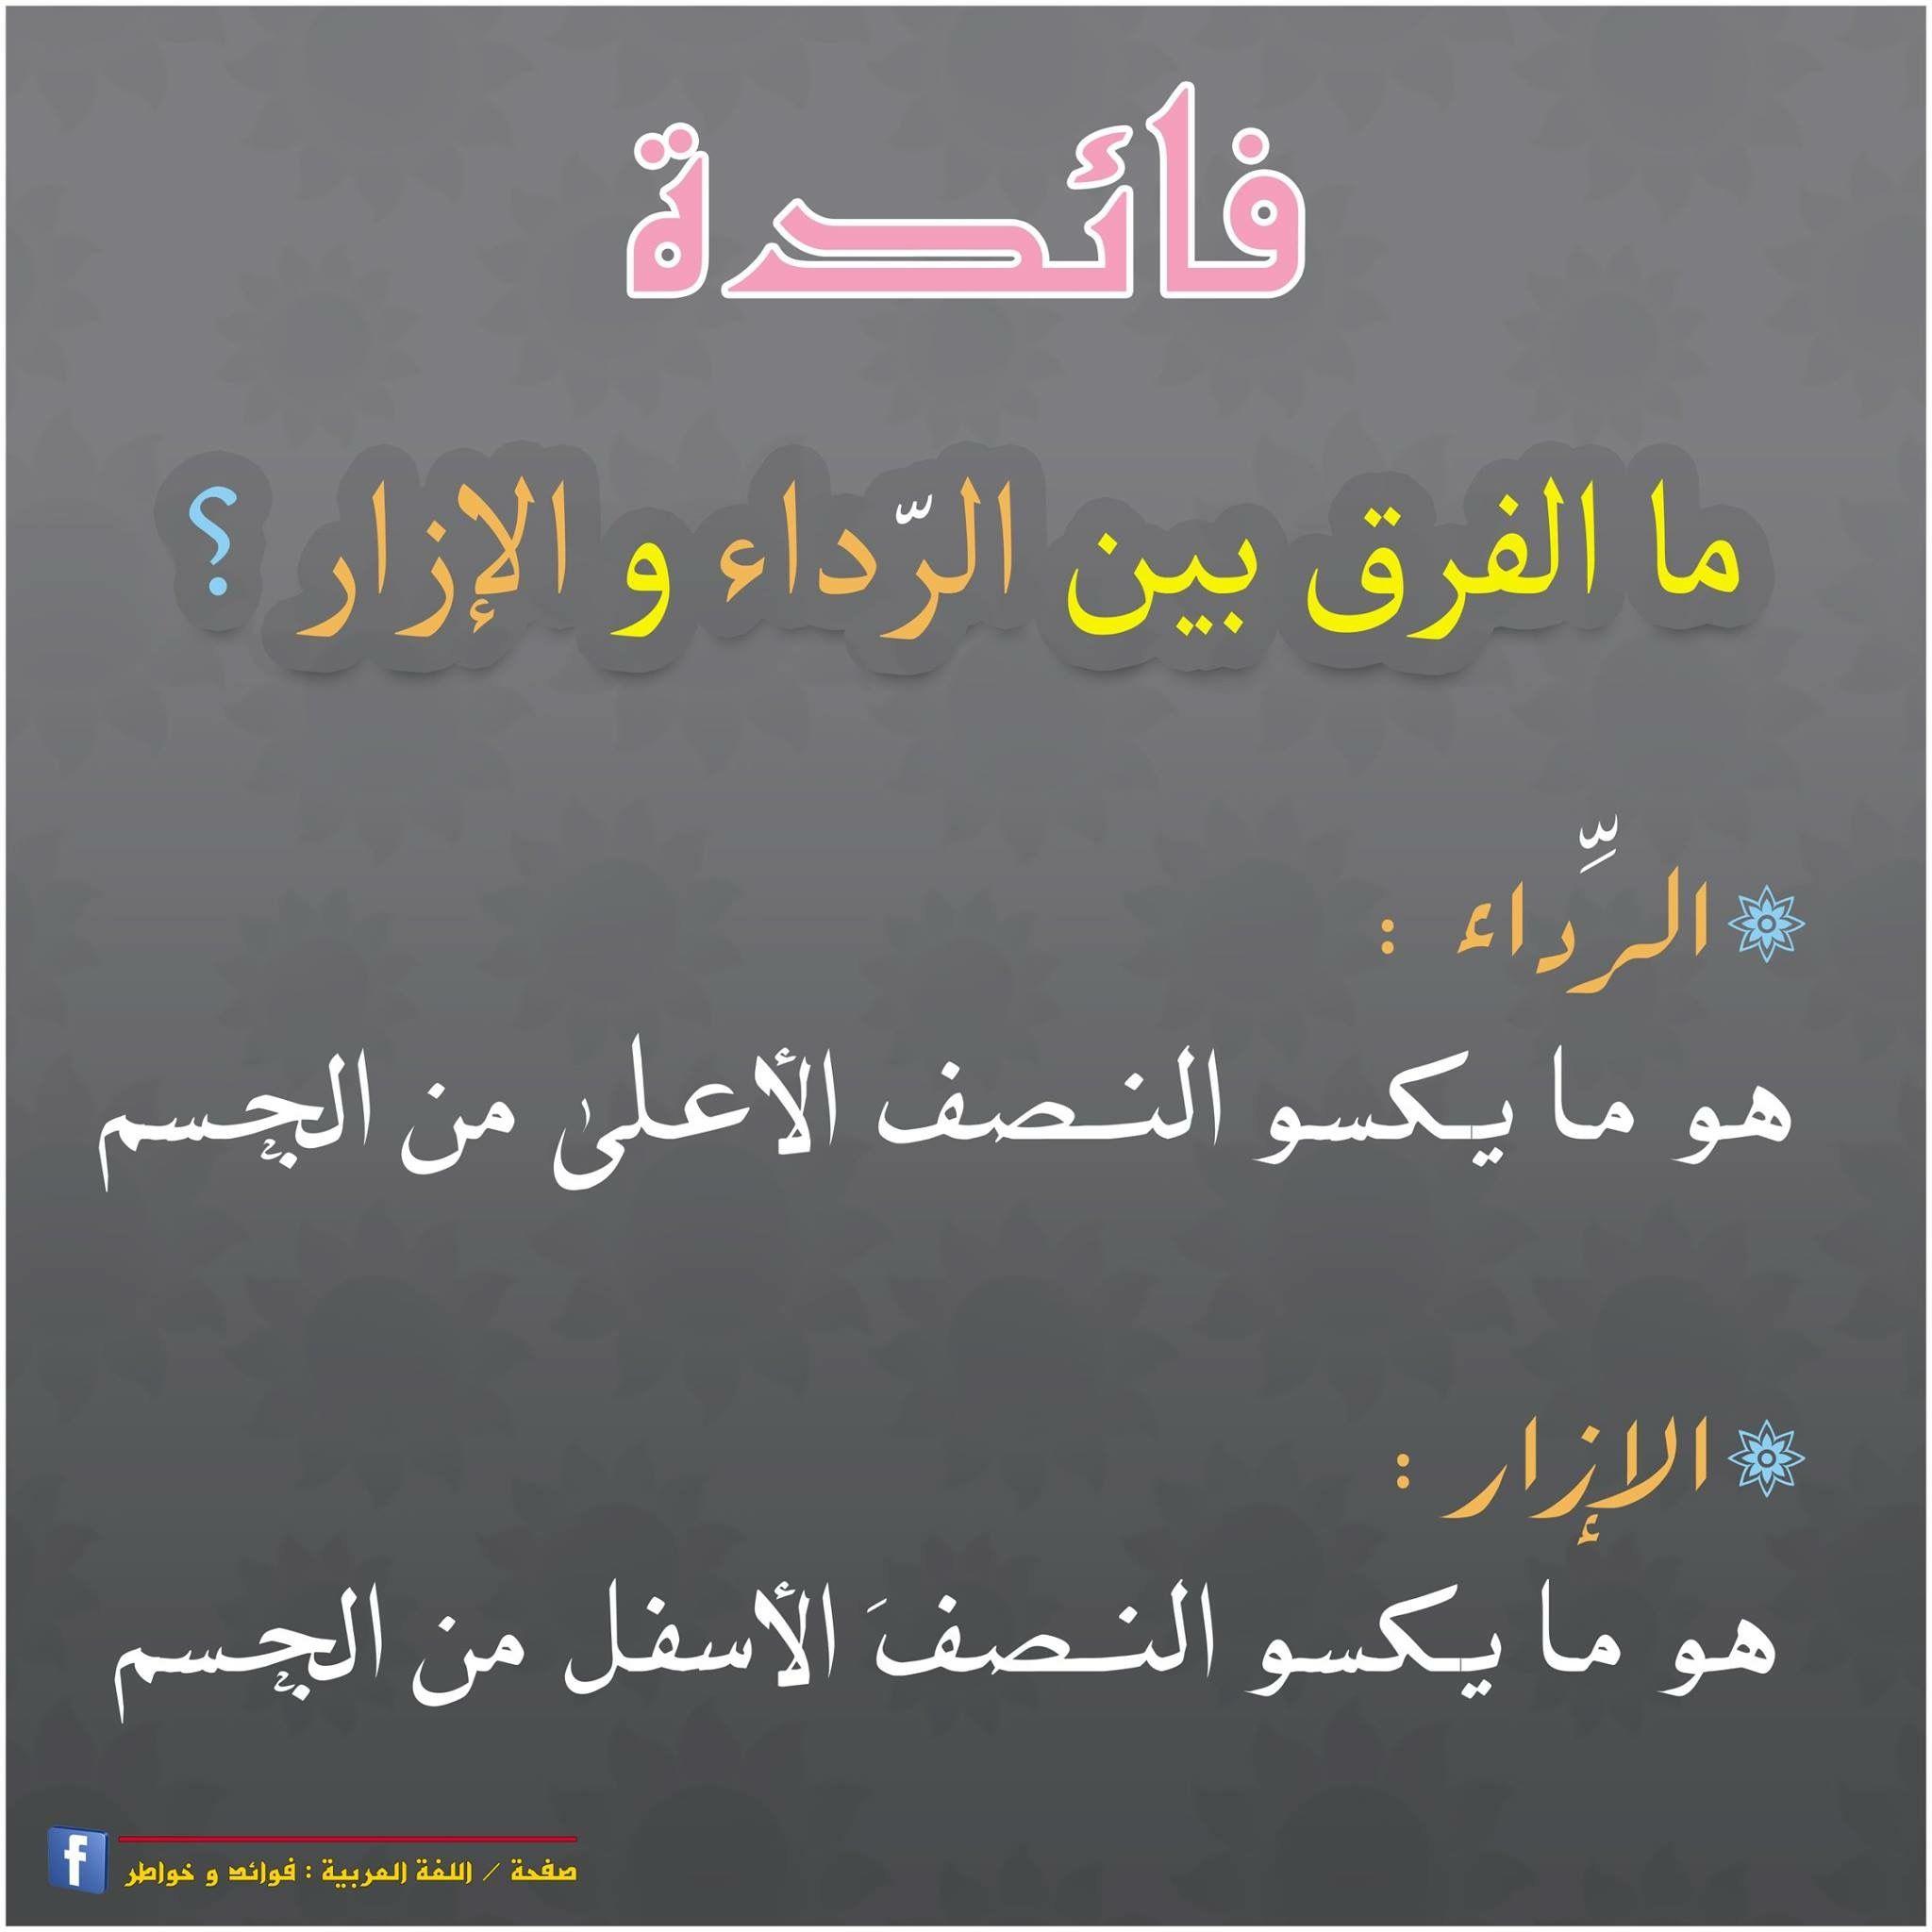 Pin By Khaled Bahnasawy On لغتنا العربية Writing Words Arabic Language Beautiful Arabic Words